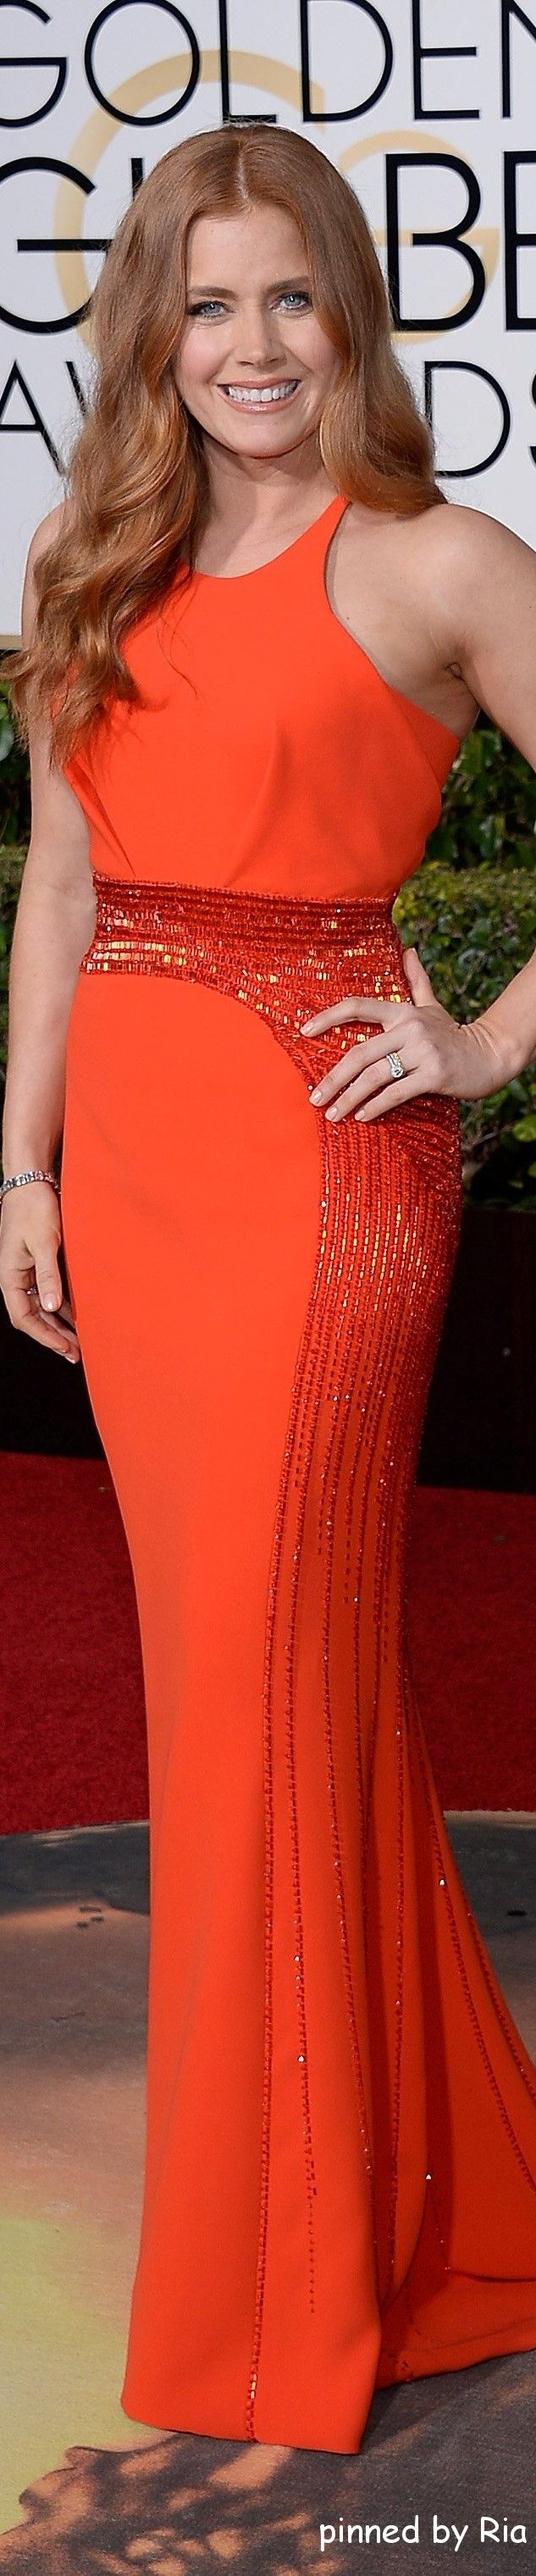 Amy Adams in Atelier Versace l Golden Globe Awards 2016 l Ria